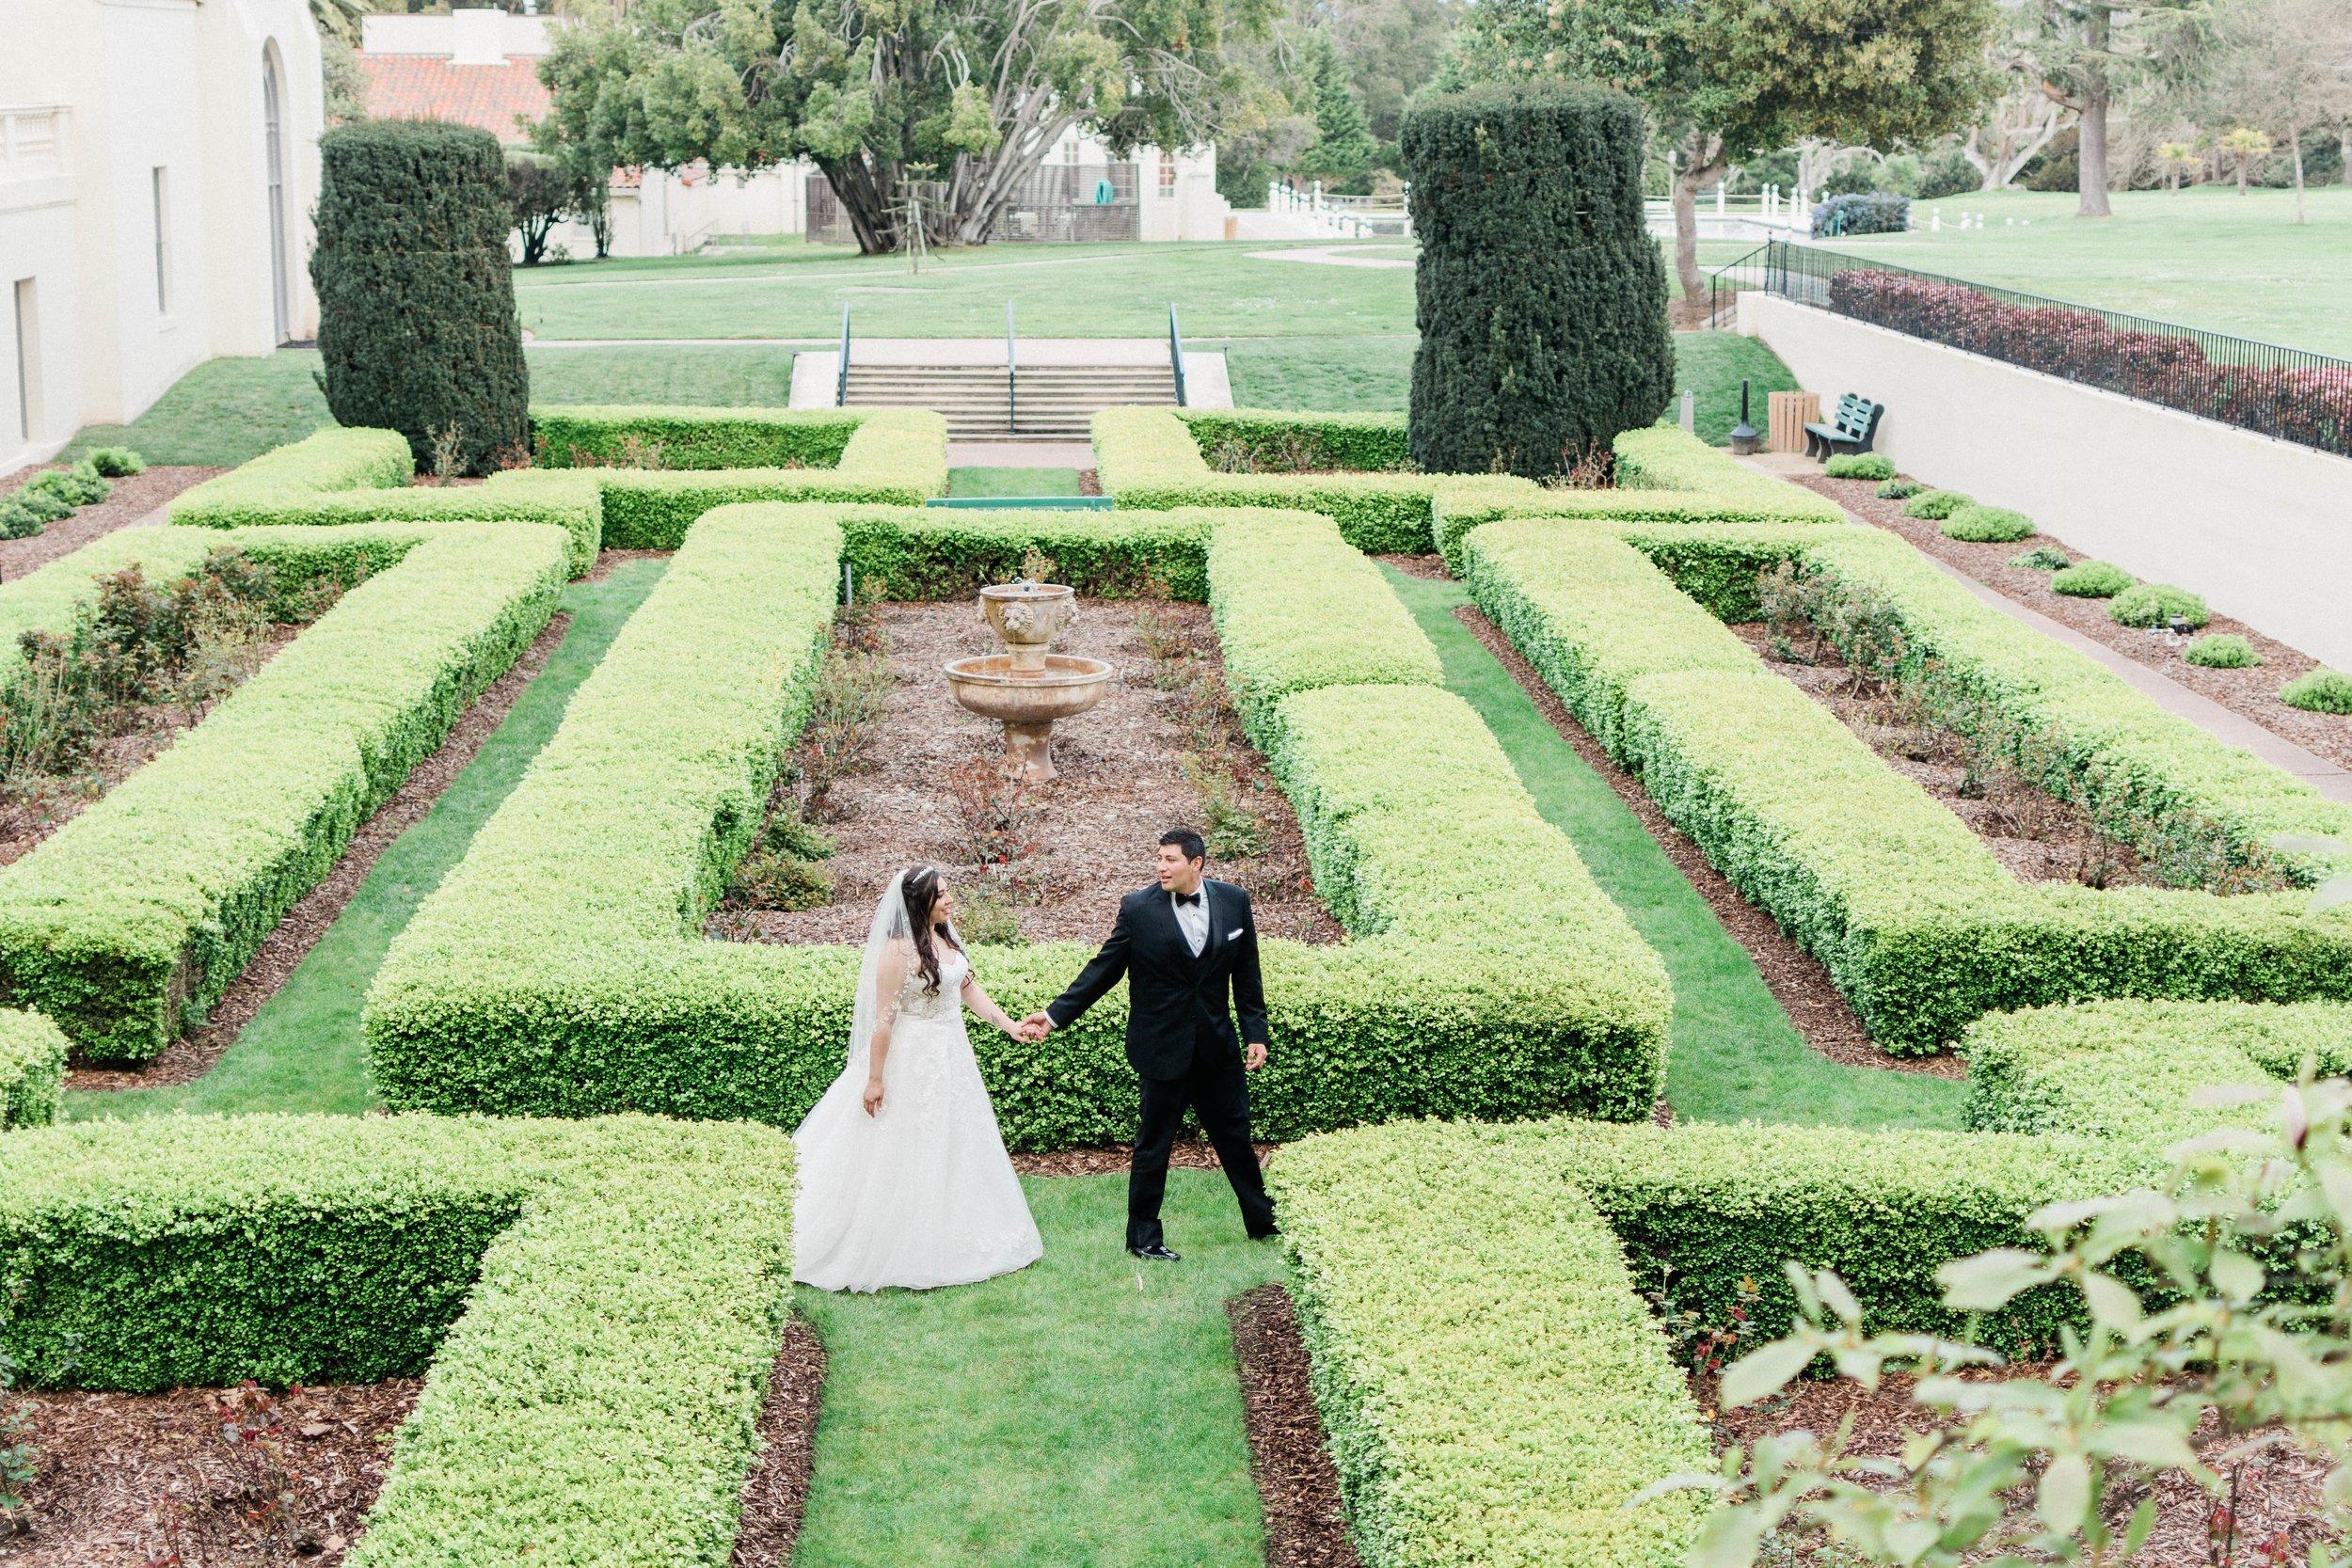 naval-postgraduate-school-wedding-in-monterey-ca-drew-zavala-photo-justin+janelle-min.jpg